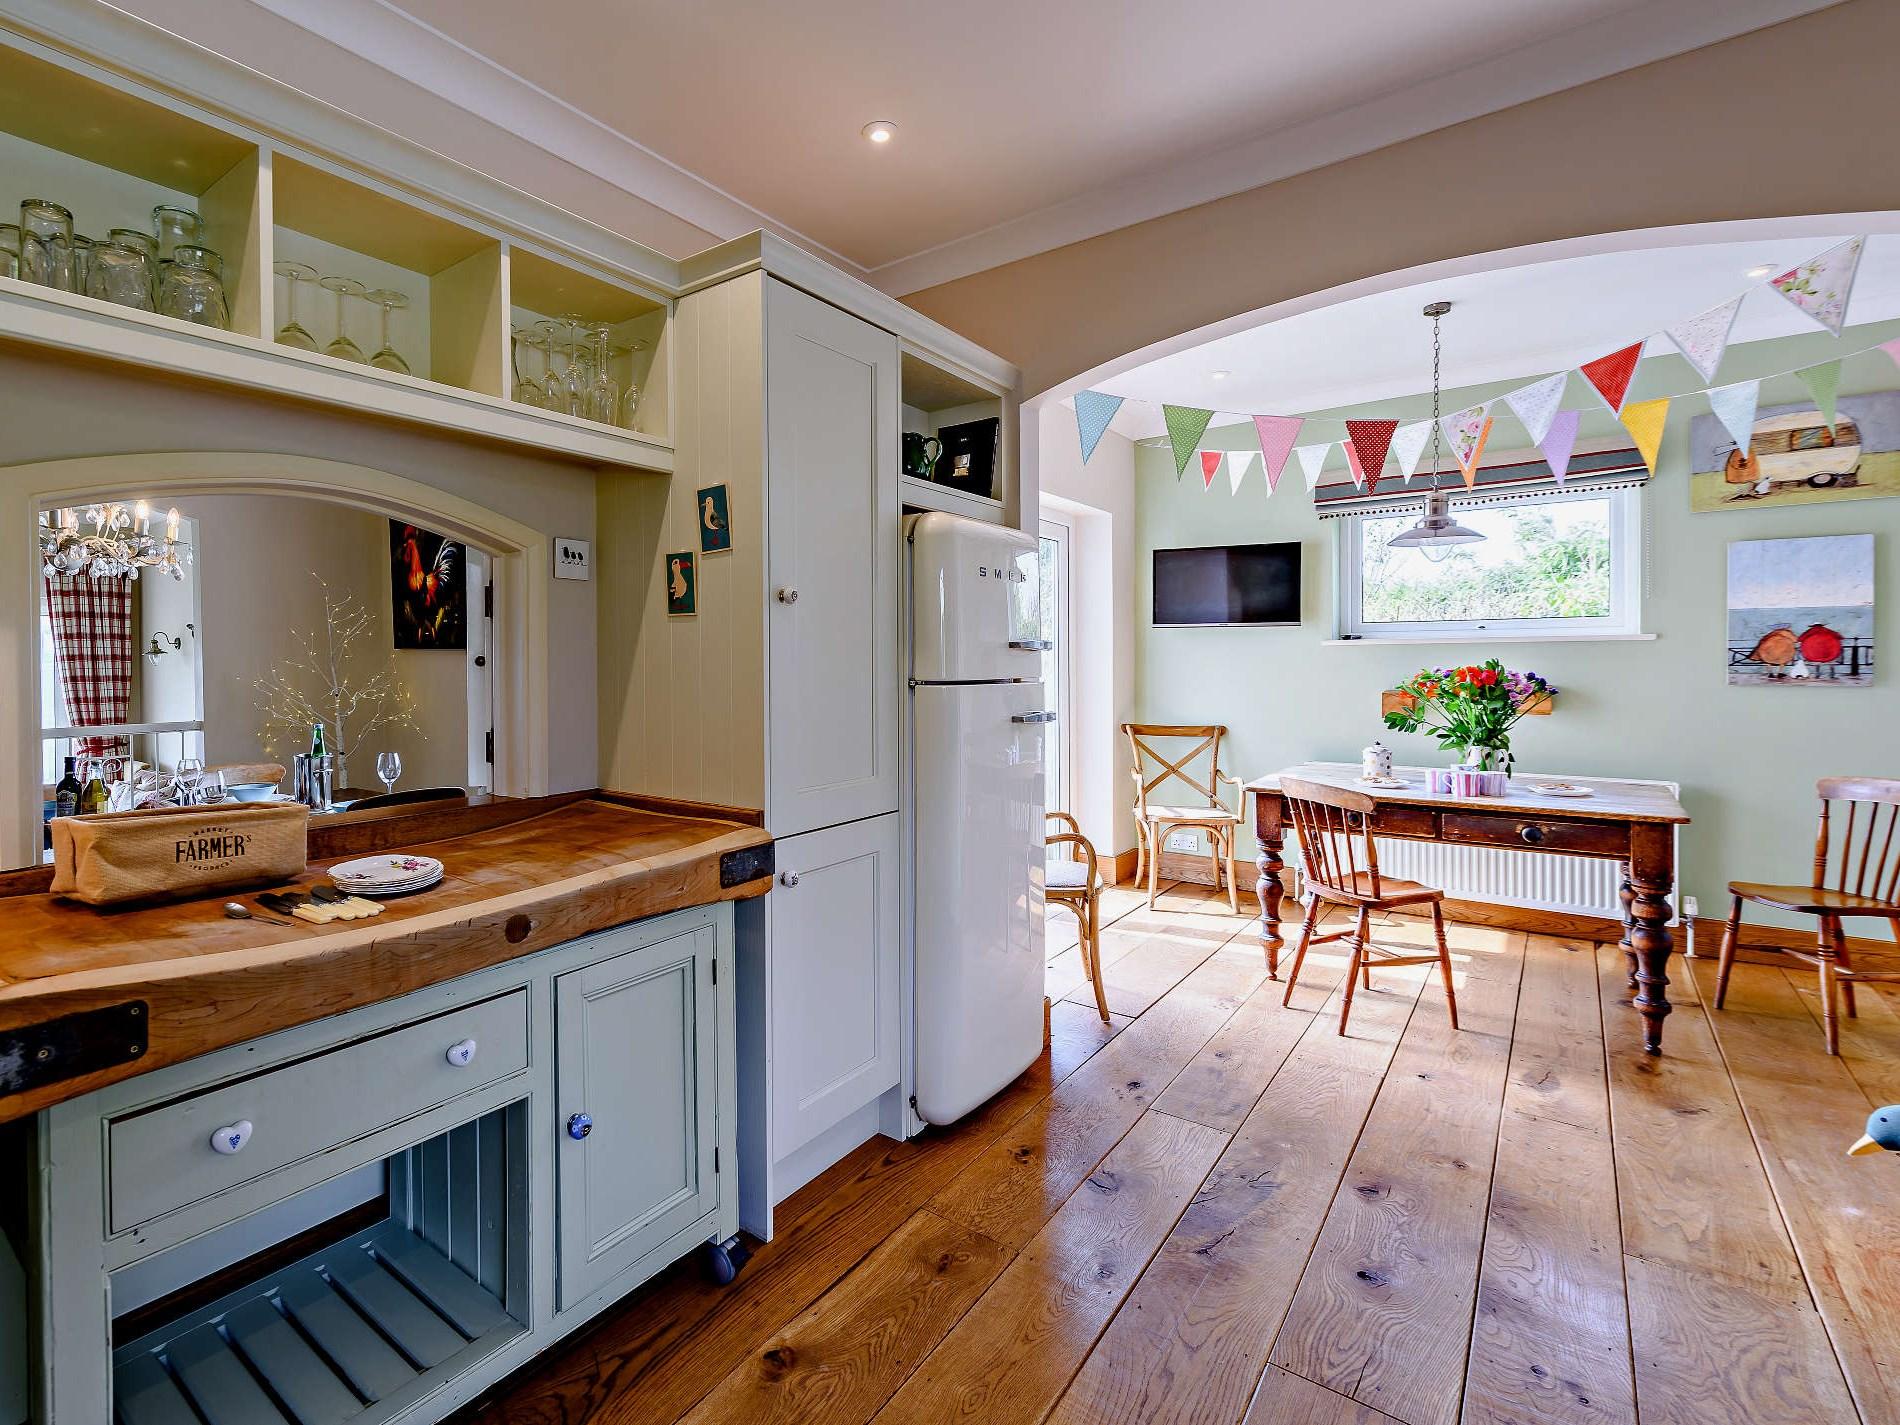 5 Bedroom Cottage in Bideford, Devon